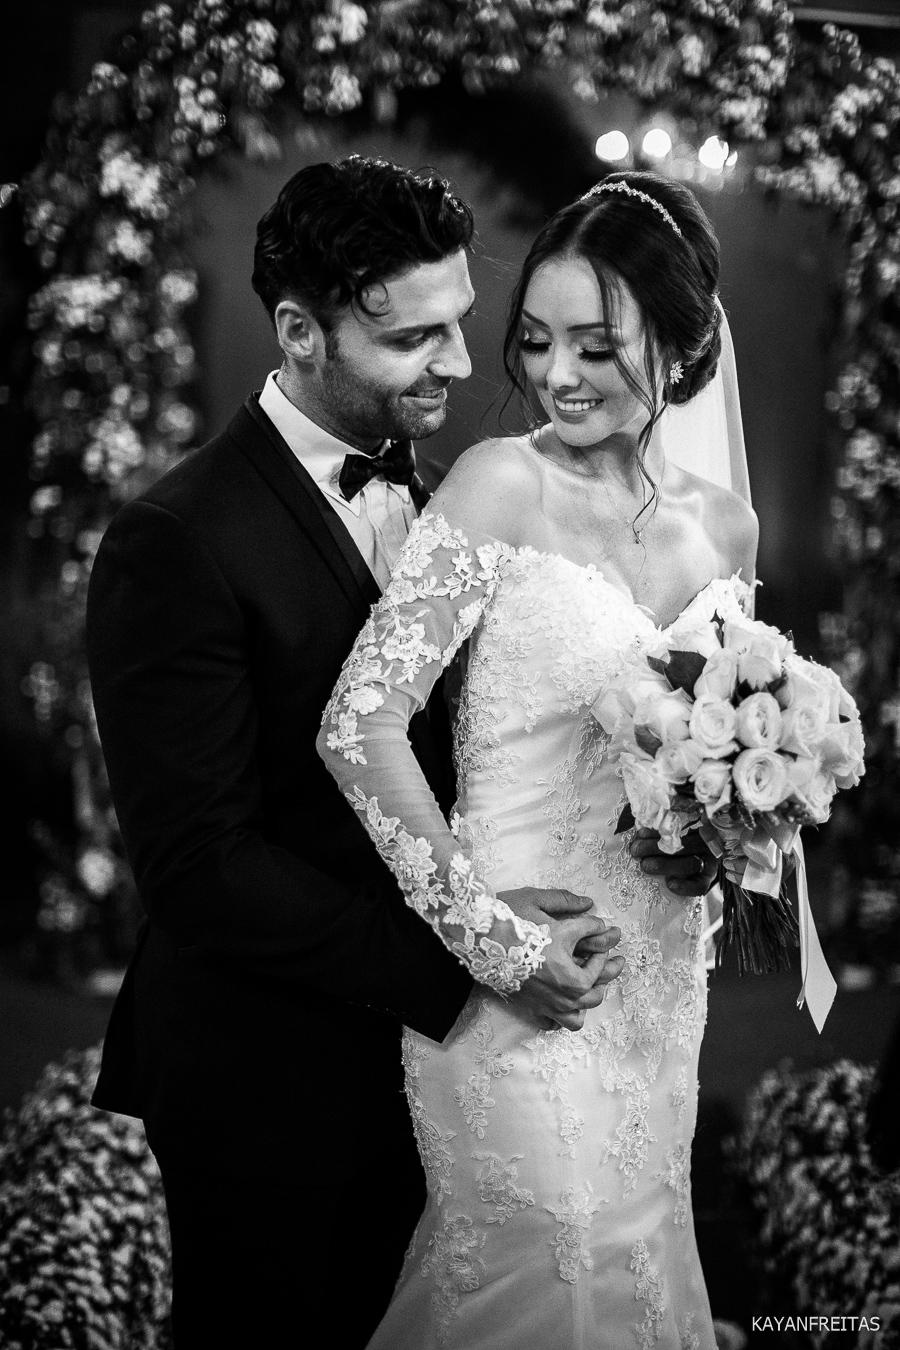 casamento-indaia-floripa-0070 Casamento Indaiá Florianópolis - Deise e Dário